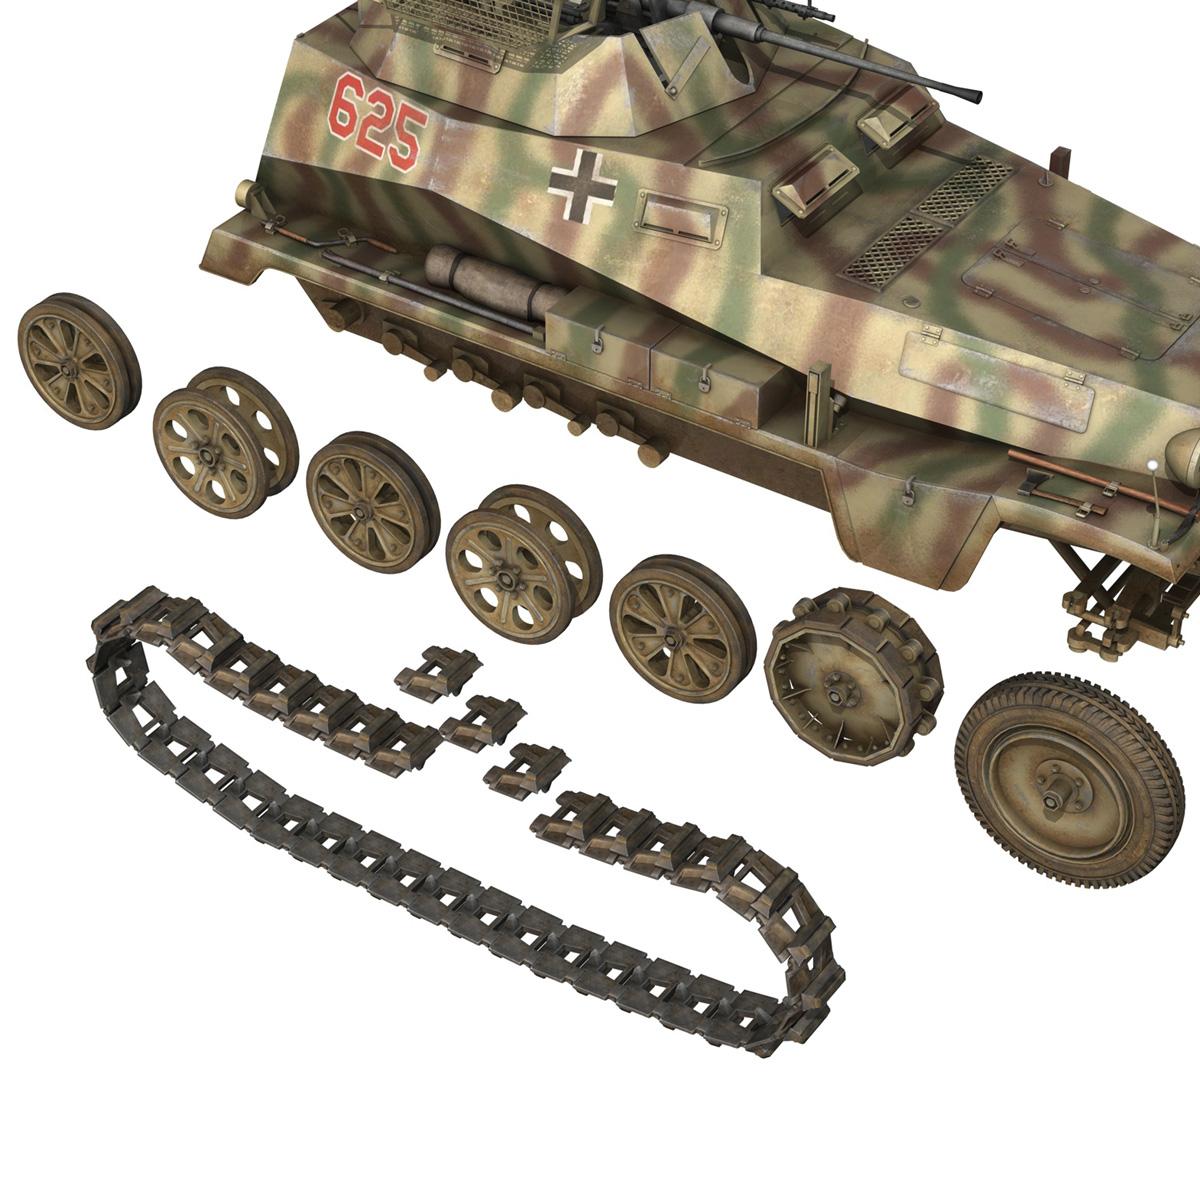 sd.kfz 250 9 – half-track armored vehicle 3d model 3ds fbx c4d lwo obj 198221